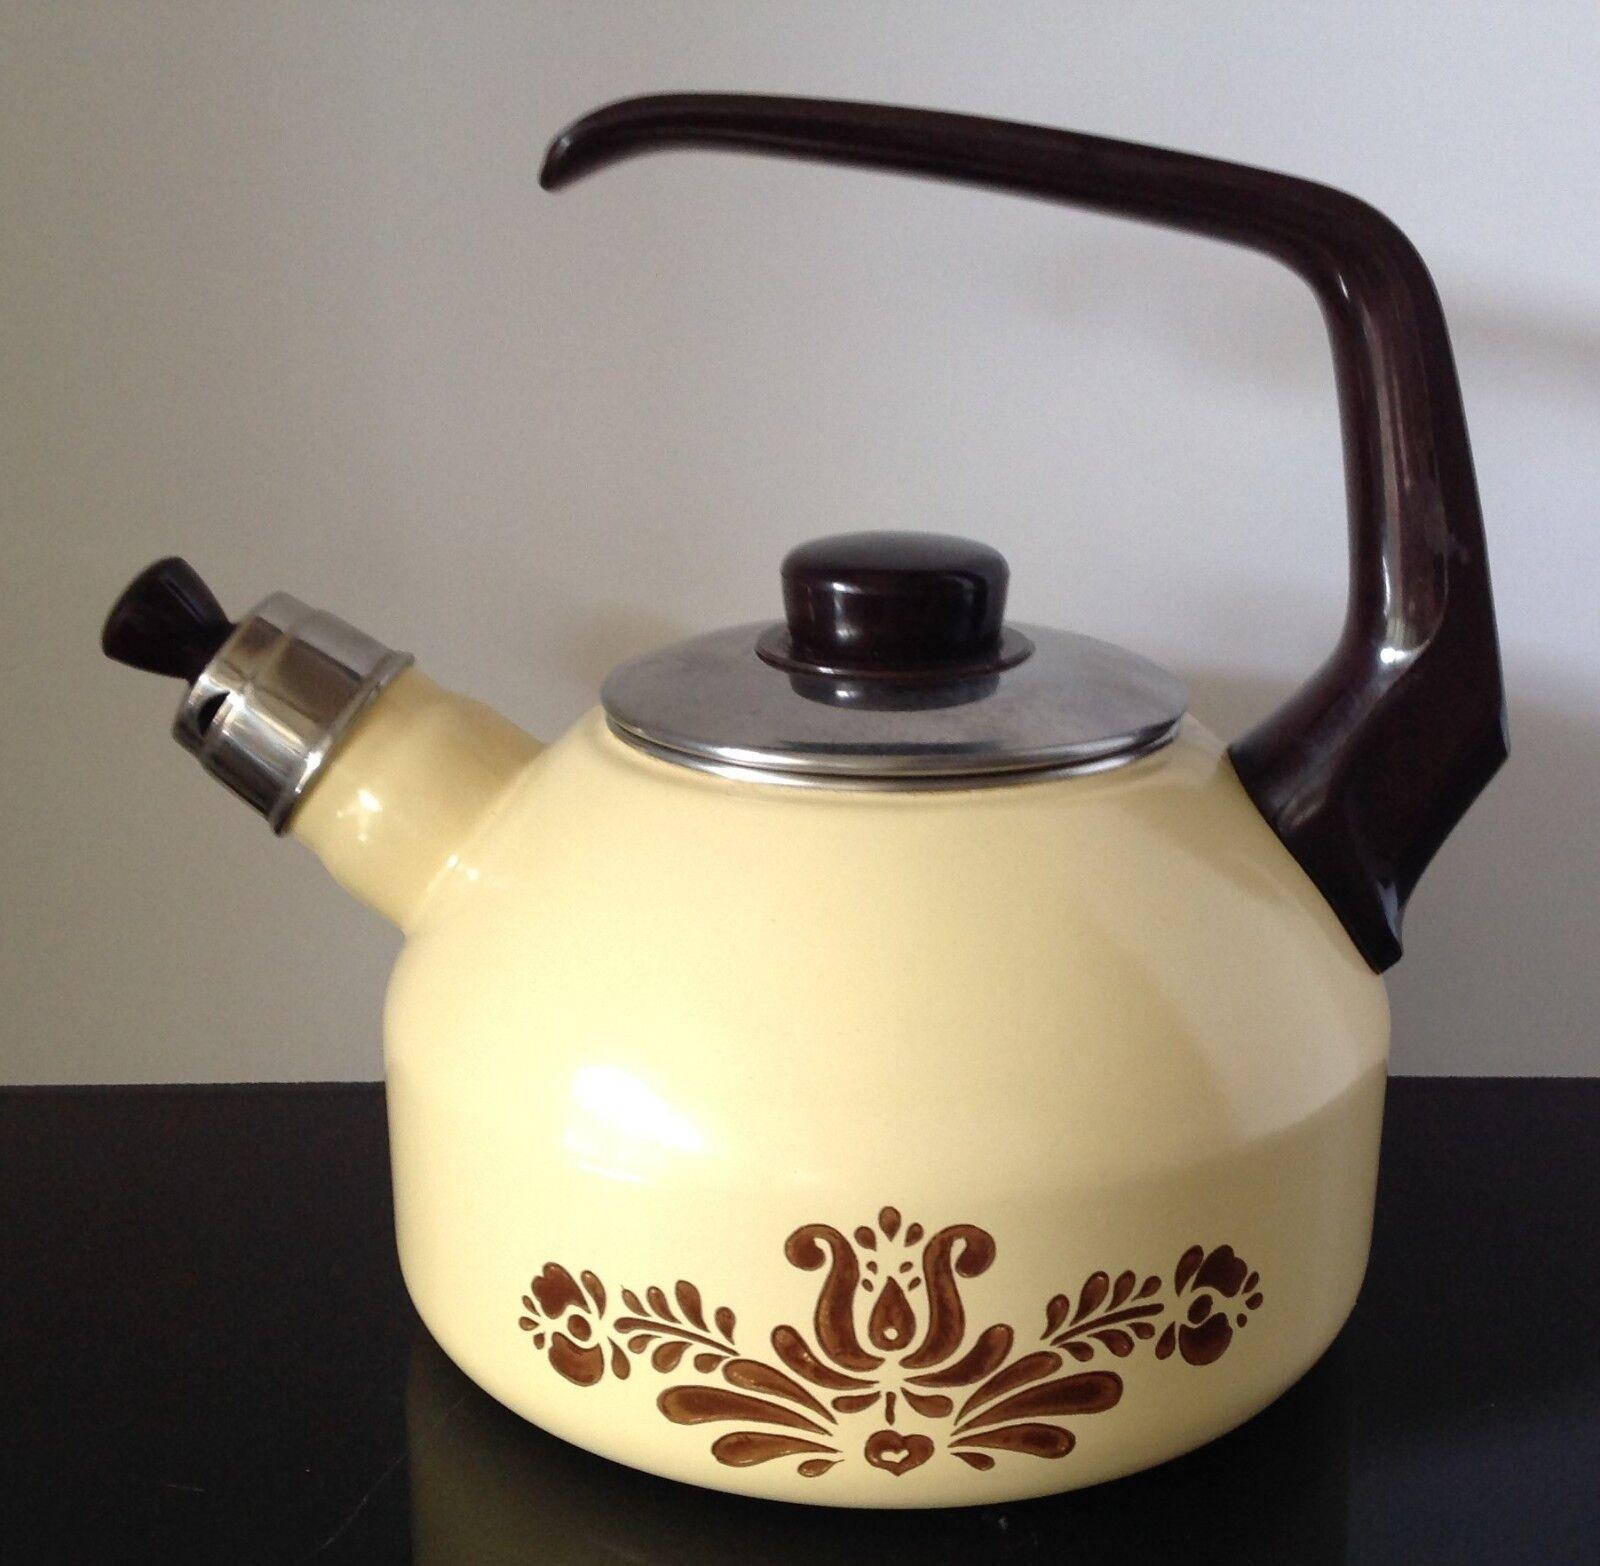 pfaltzgraff tea kettle village pattern whistling heavy metal 2 quart